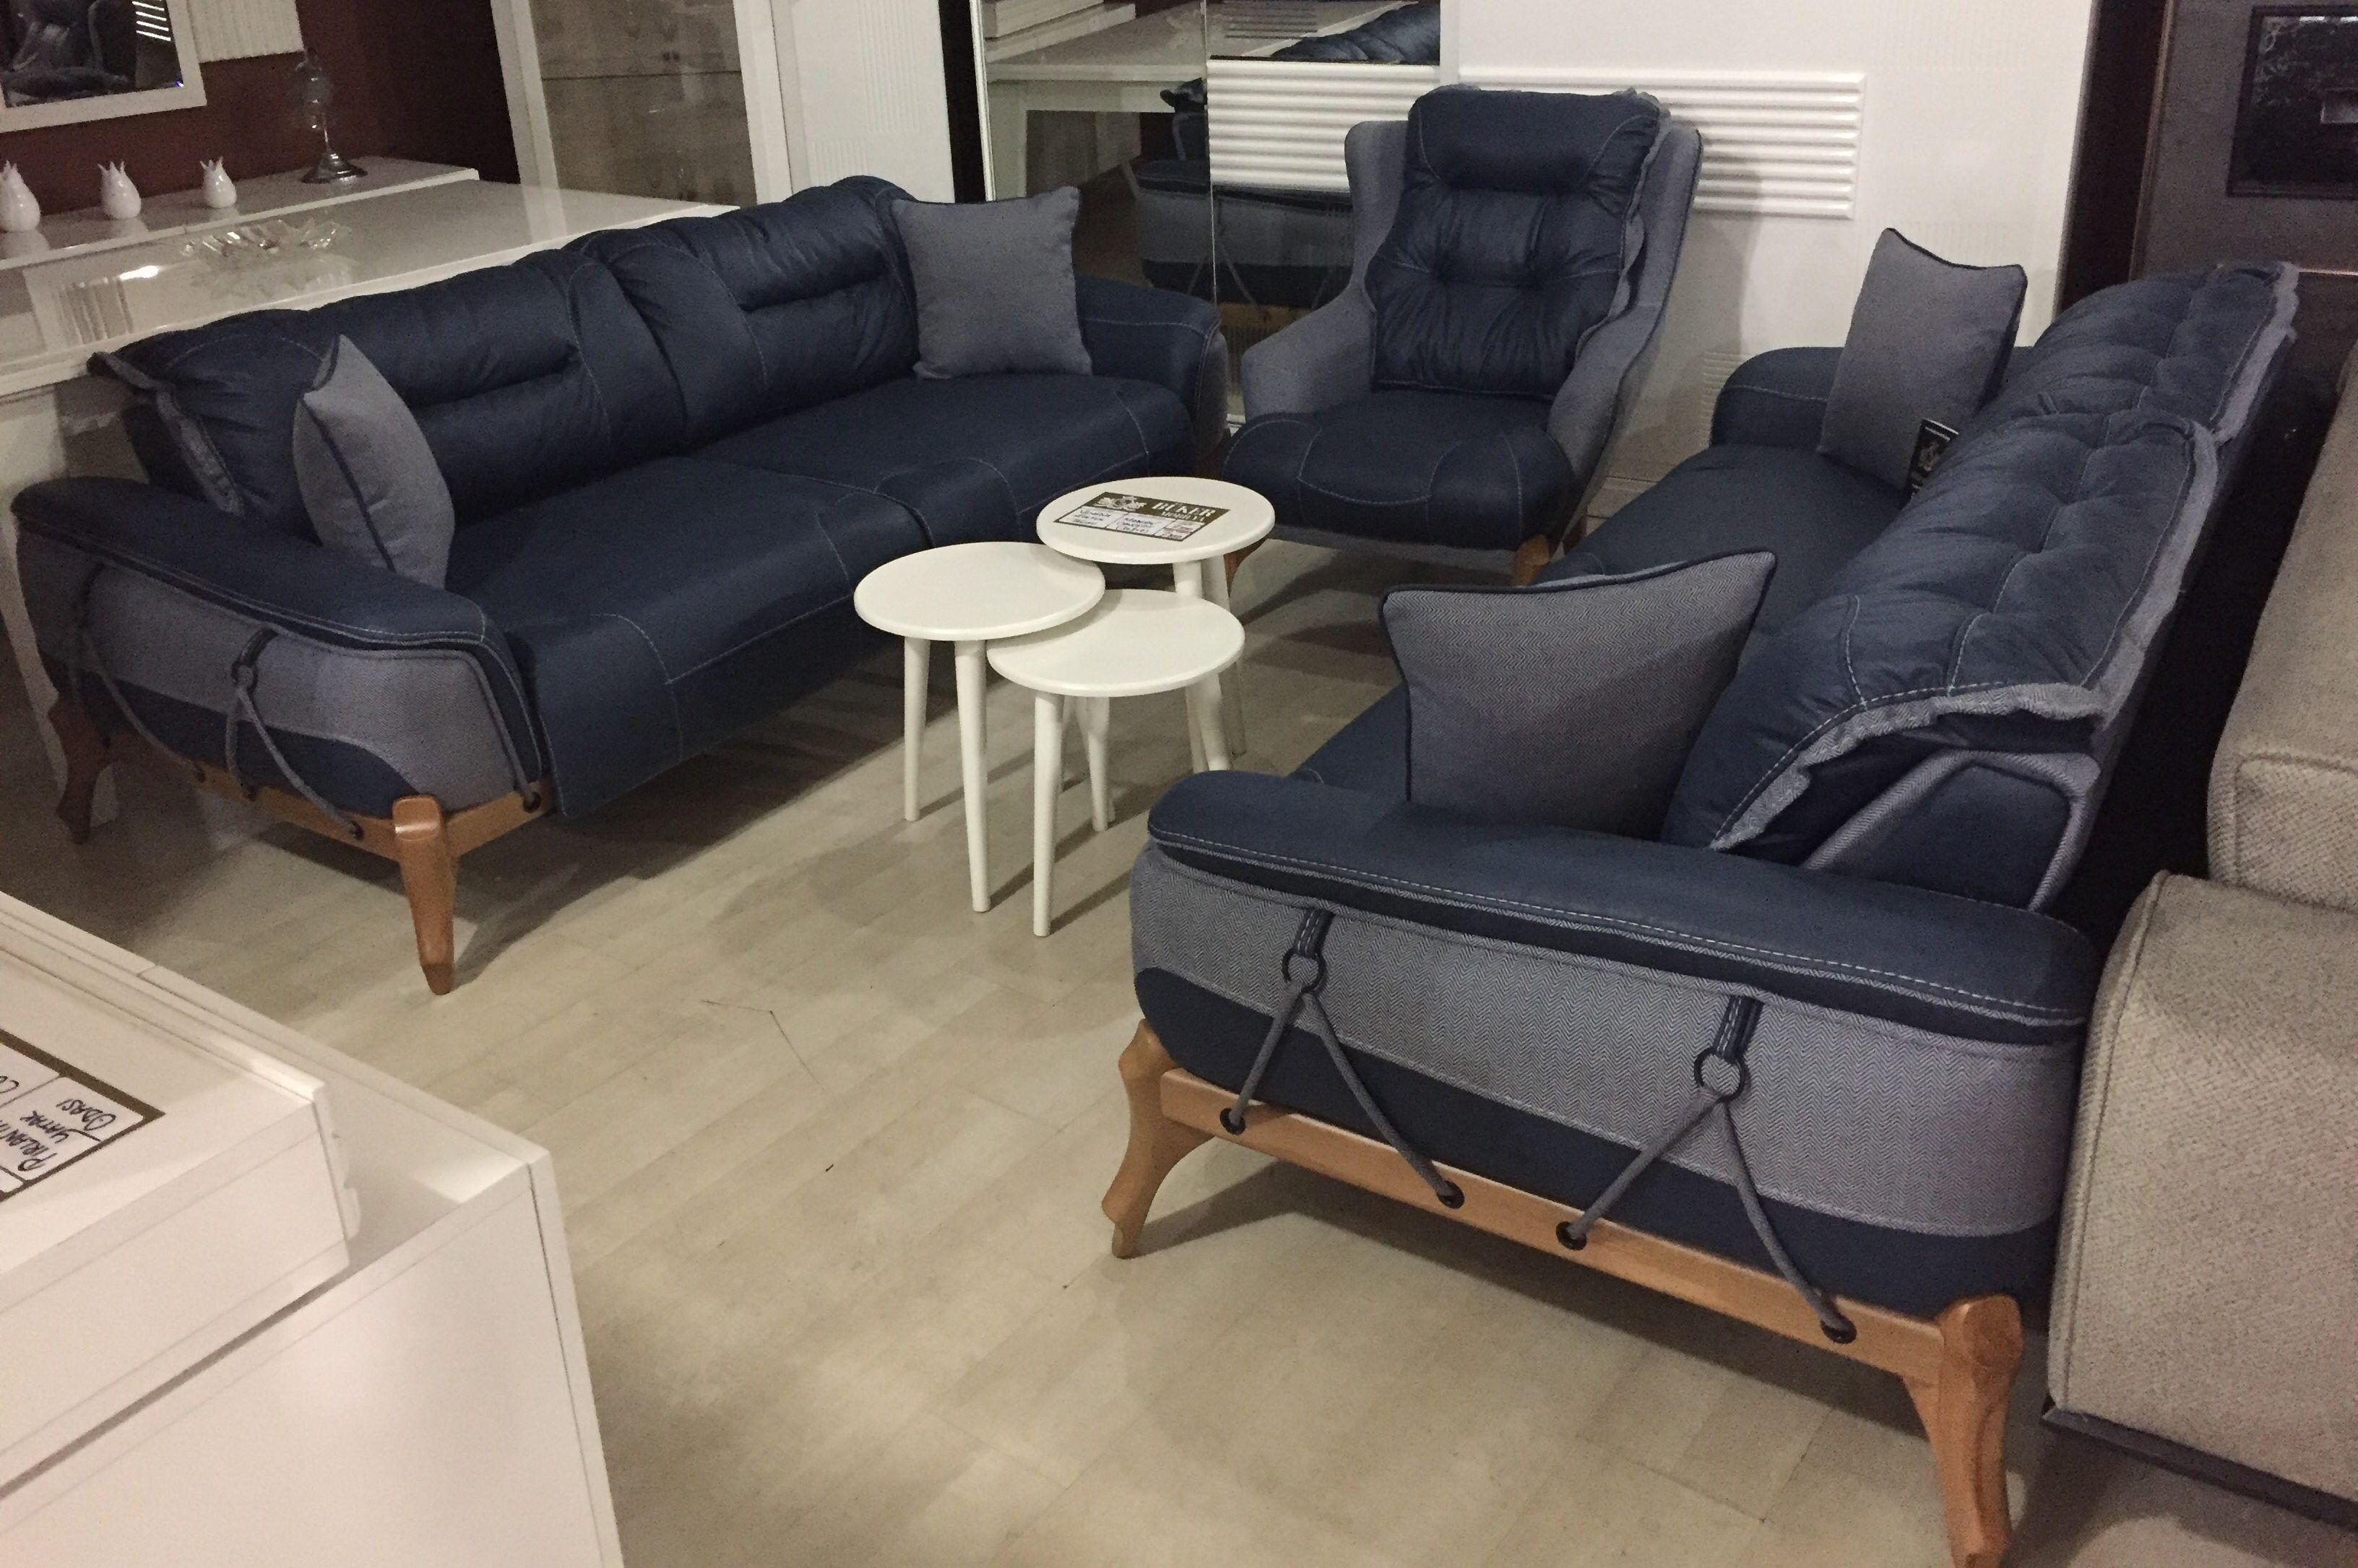 Pin By Hasan Keskin On Koltuklar Modern Sofa Designs Furniture Sofa Design